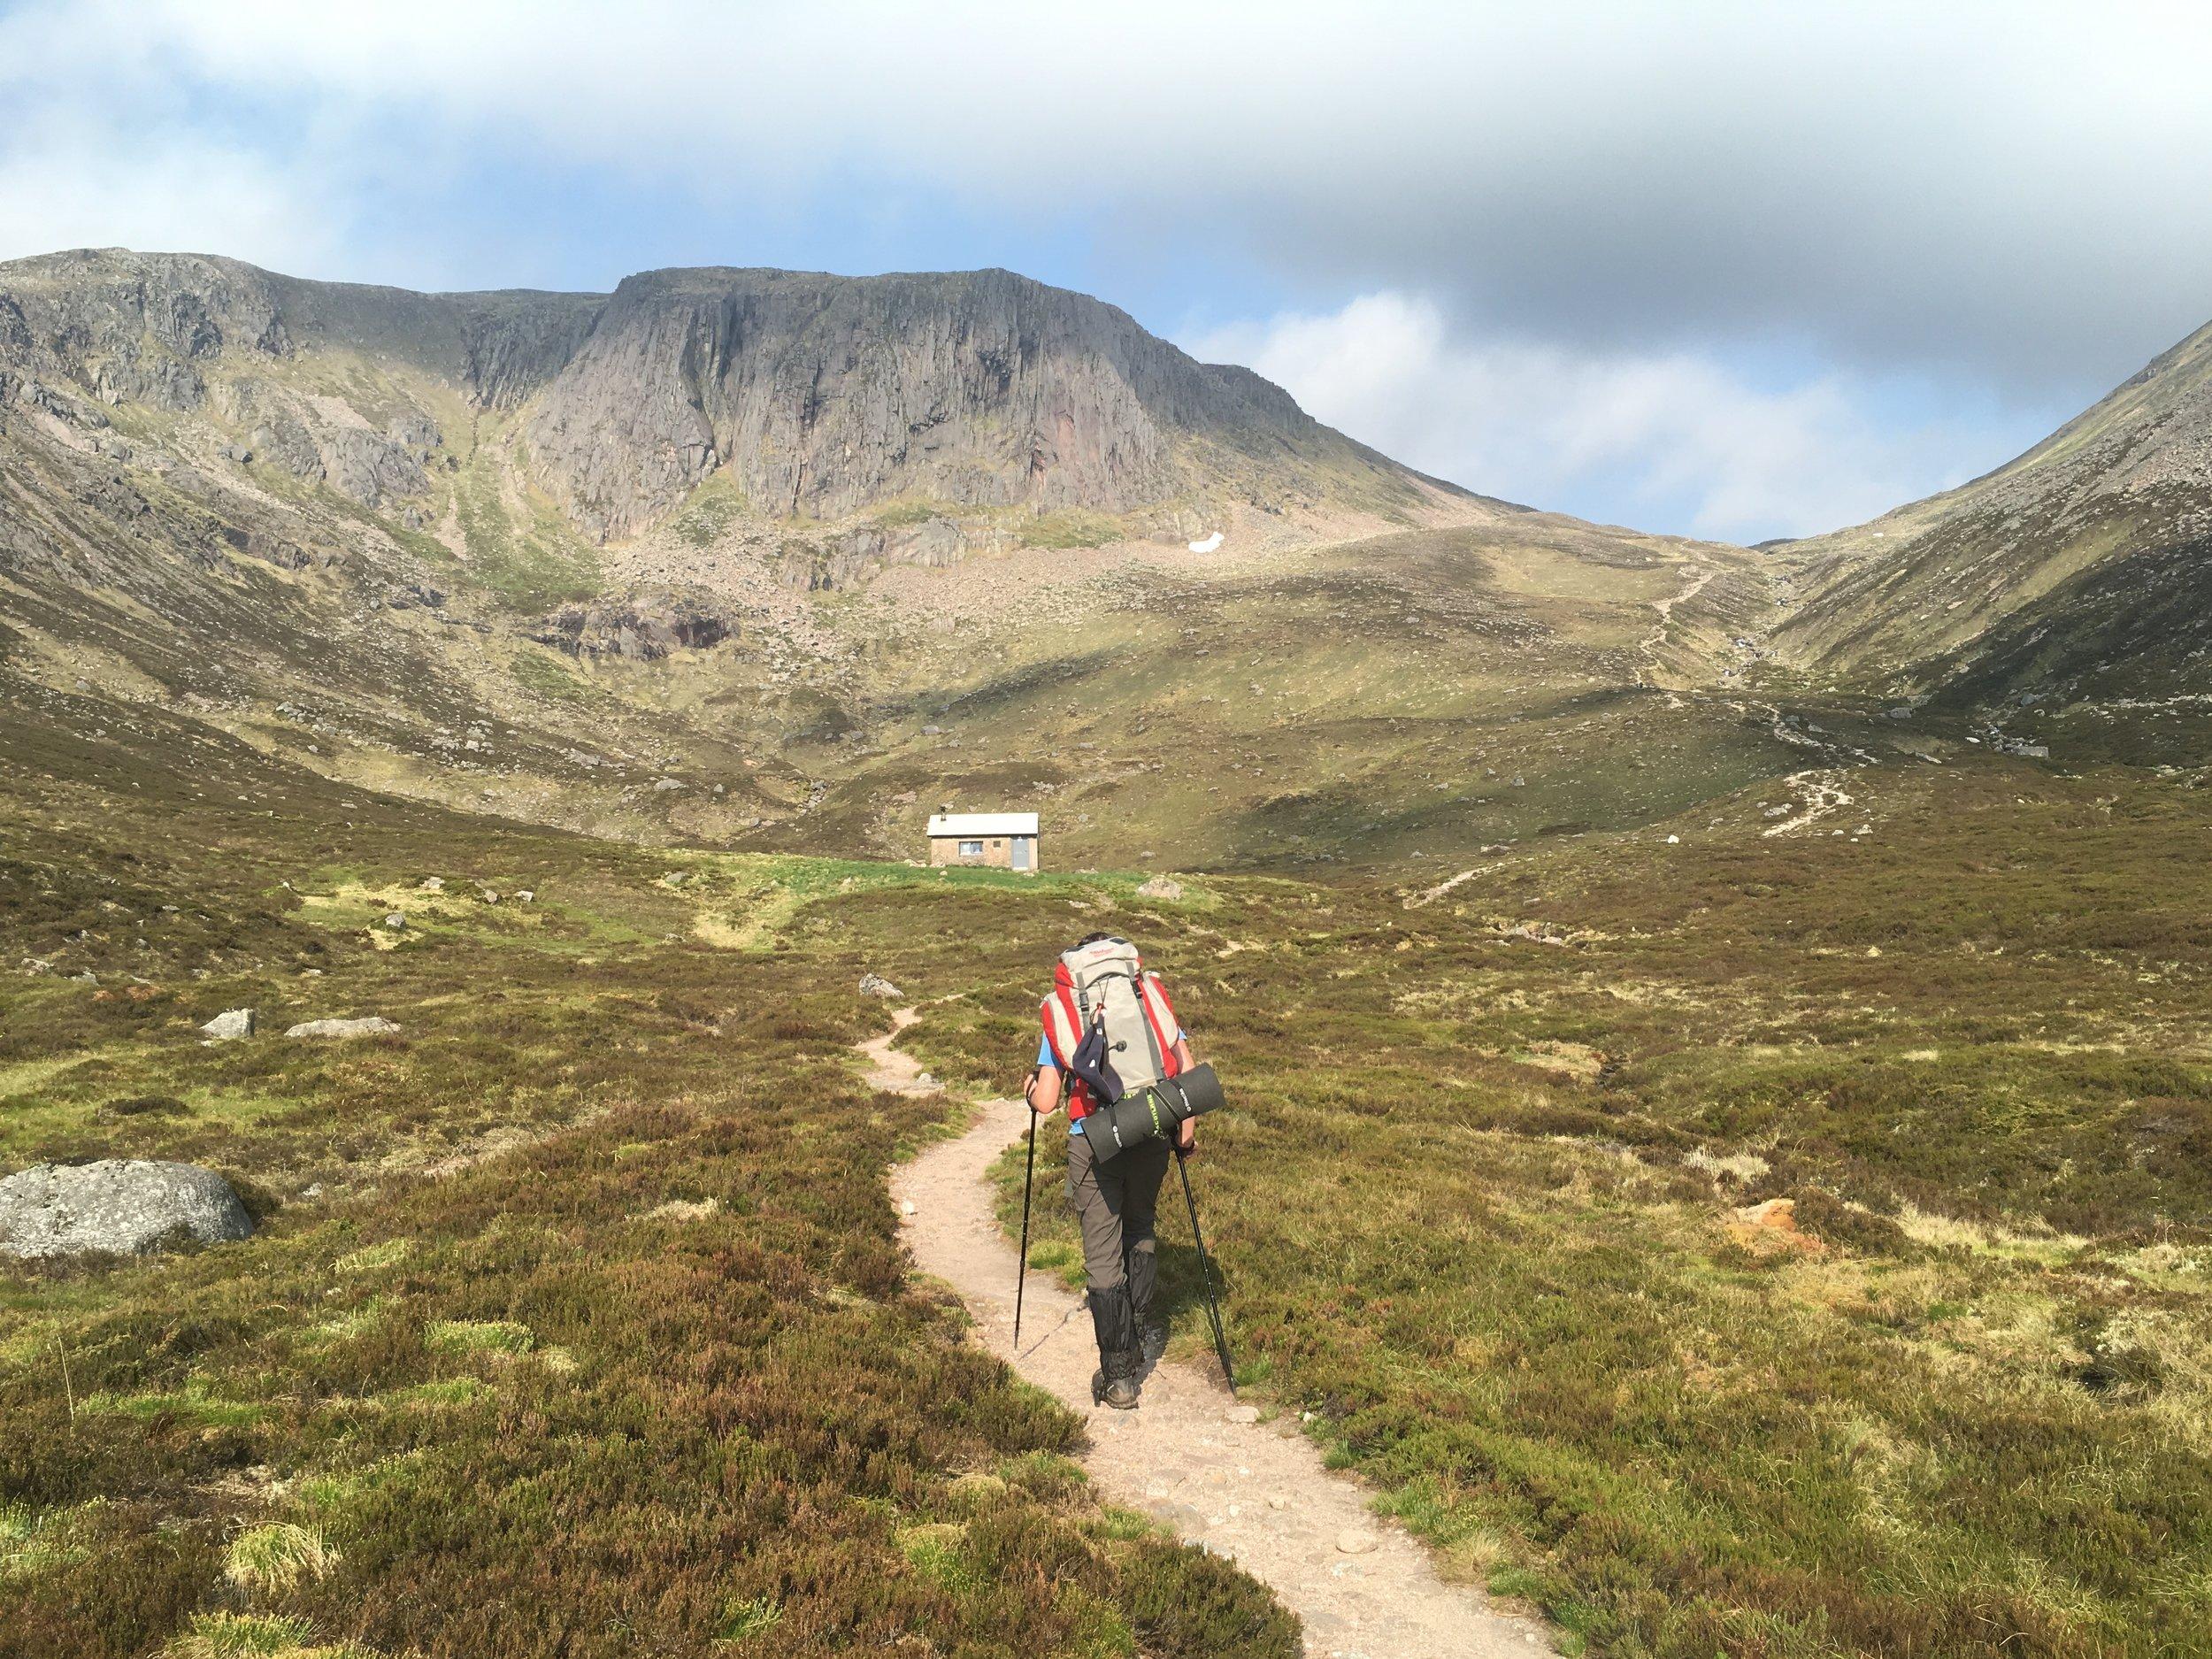 Steve King approaching Hutchison Memorial Hut, Cairngorm Mountains, Scotland. Photograph: Dan Richards